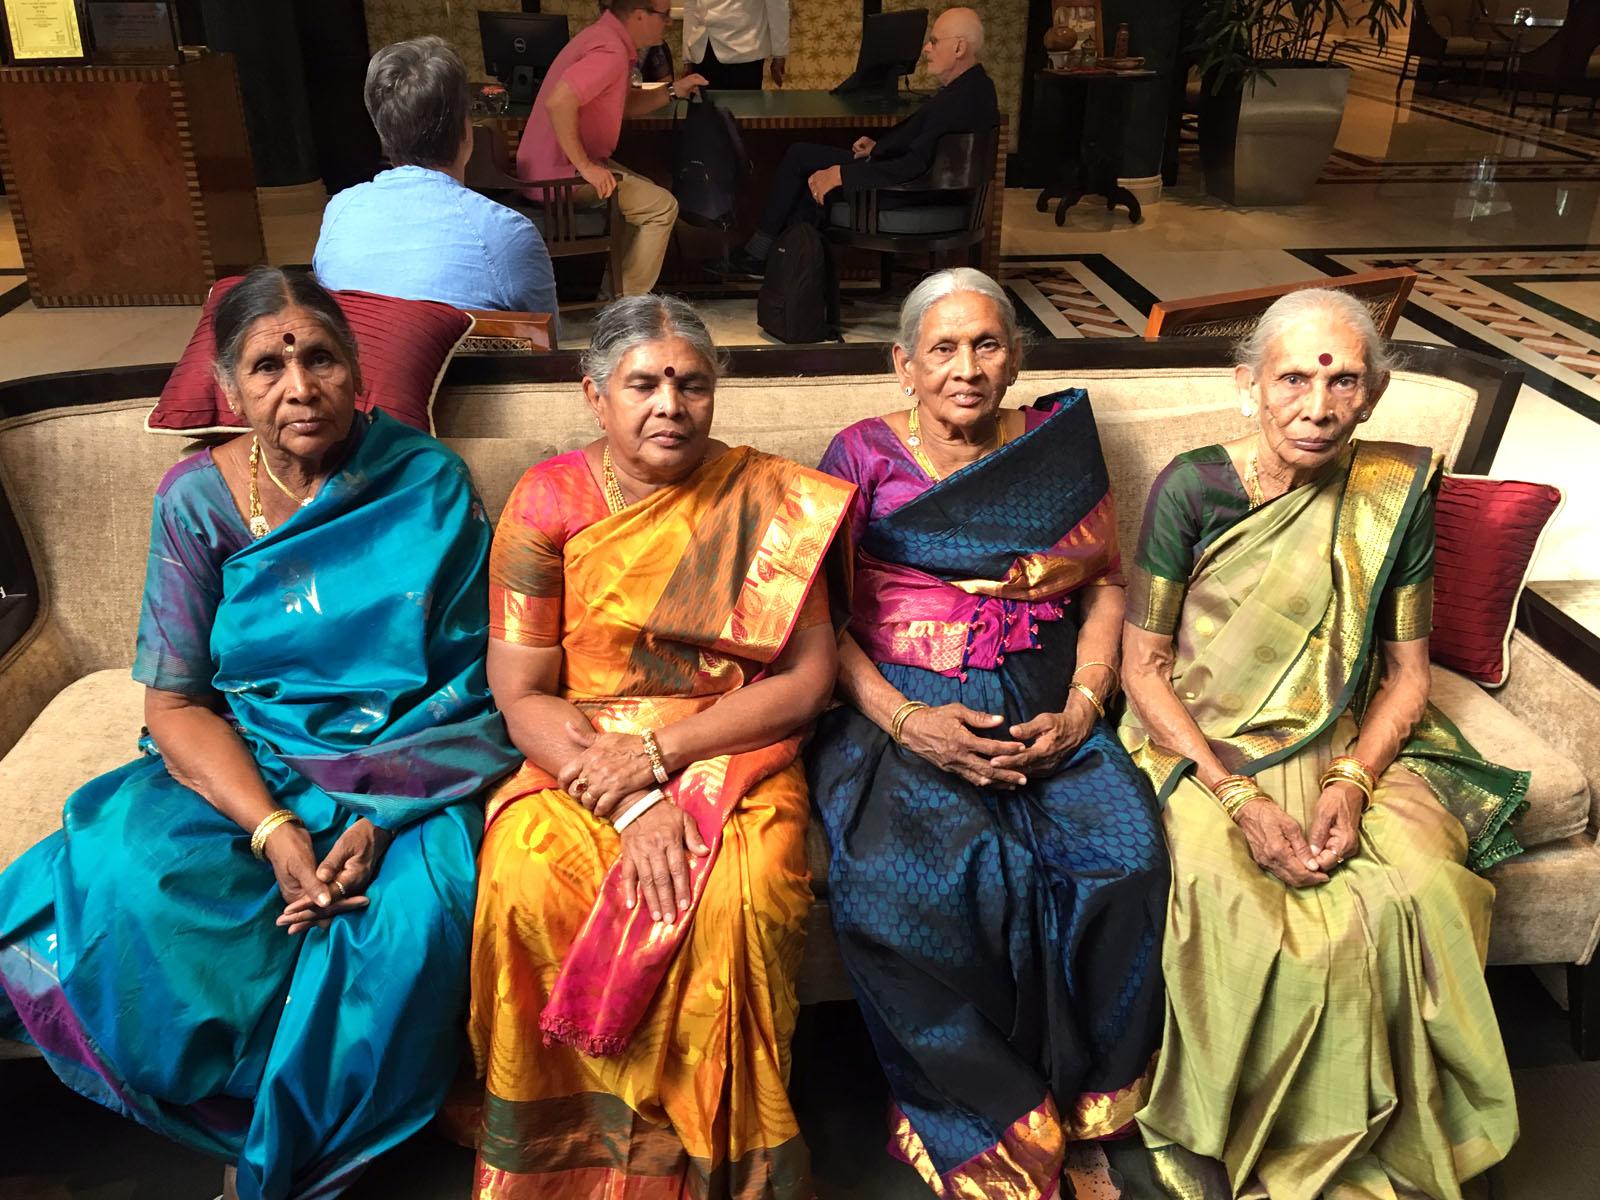 ladies-in-sarees-at-taj-hotel.jpg